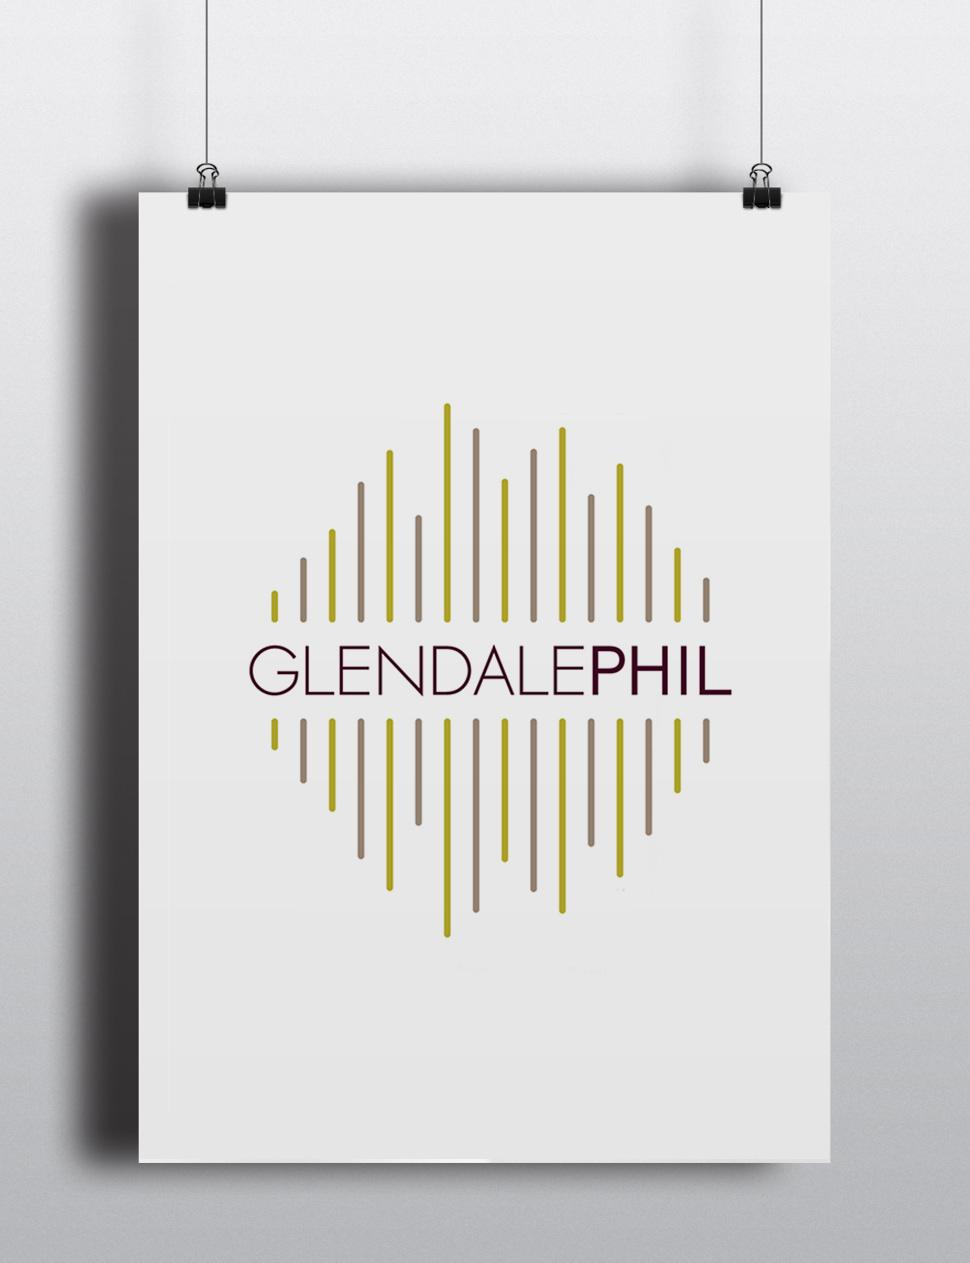 glendale_phil